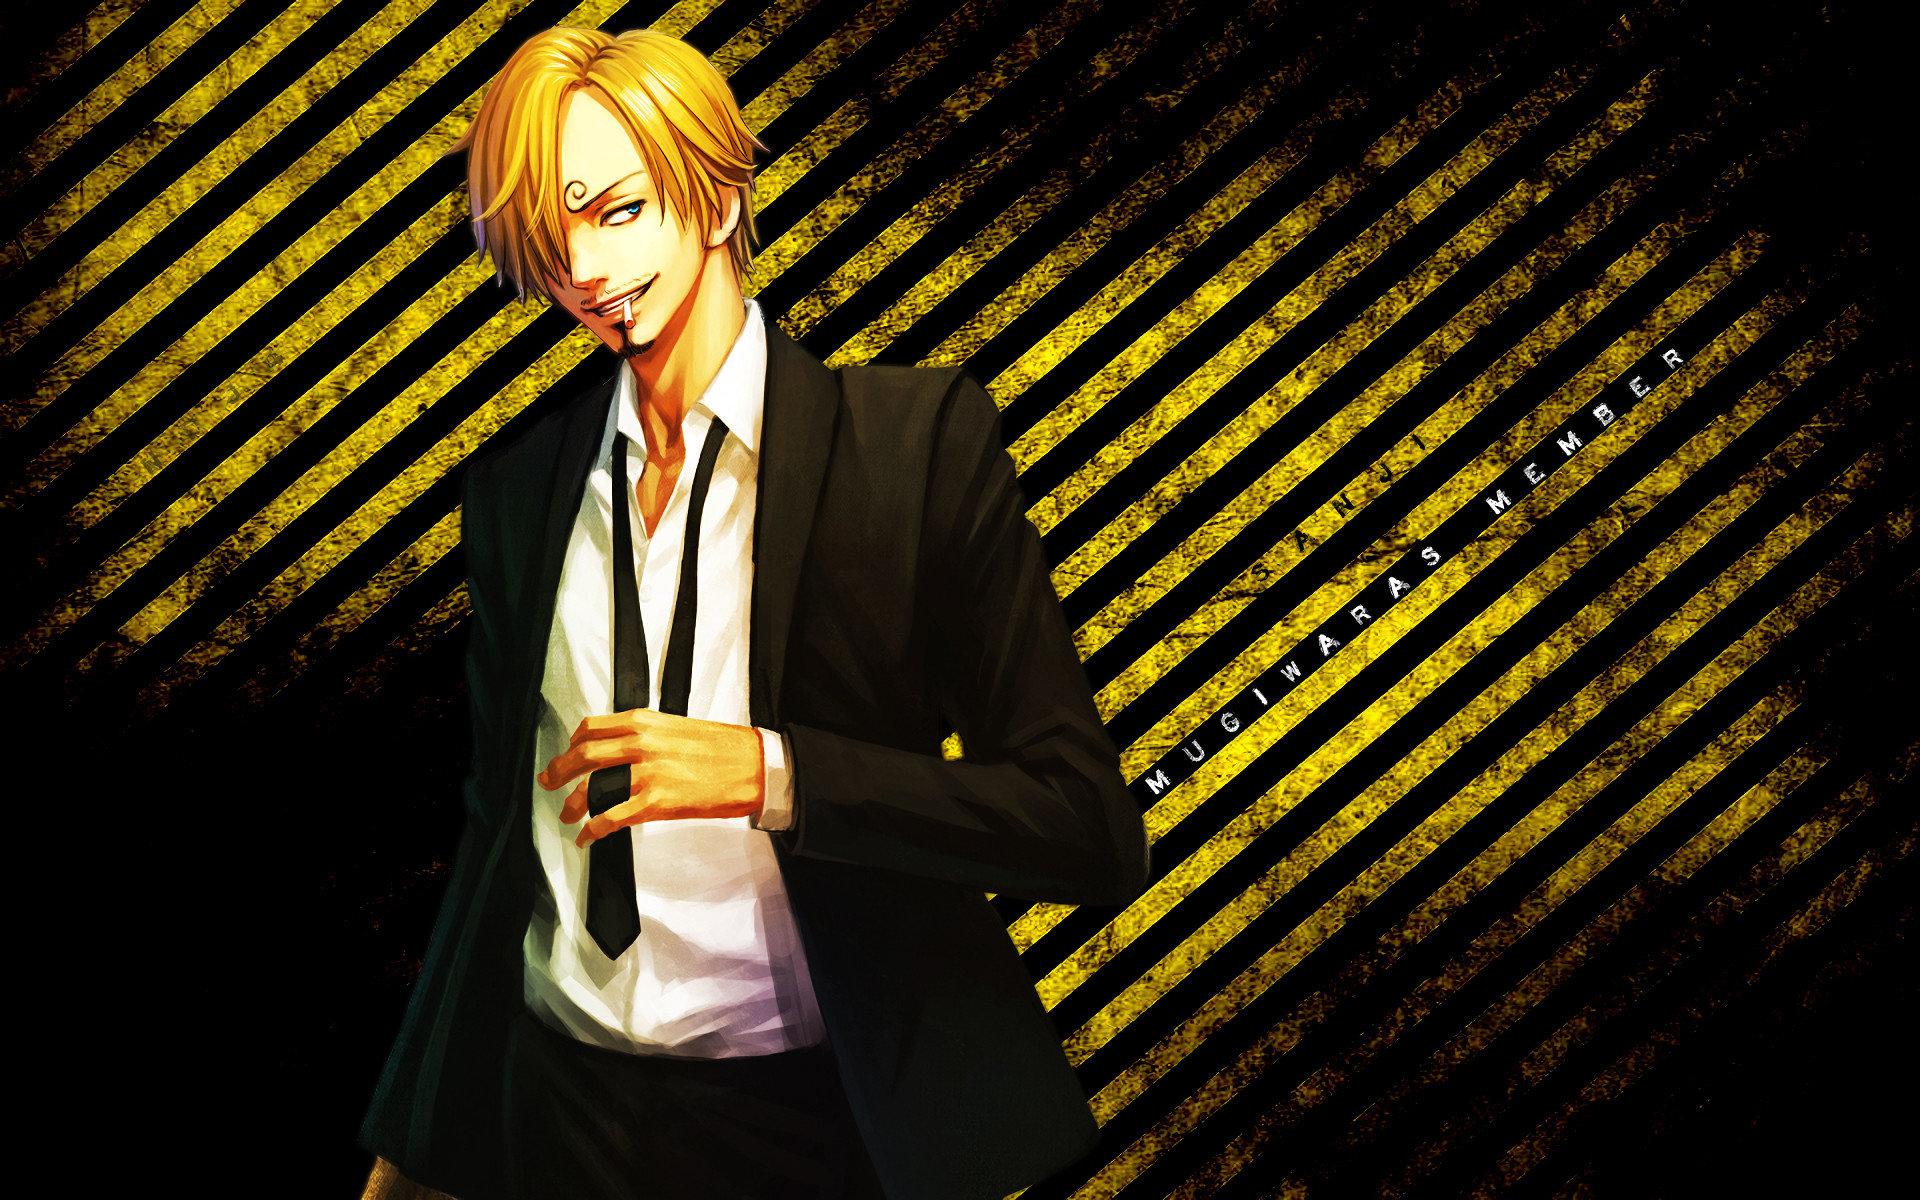 Free Download Sanji One Piece Wallpaper Id 314865 Hd 1920x1200 For Pc